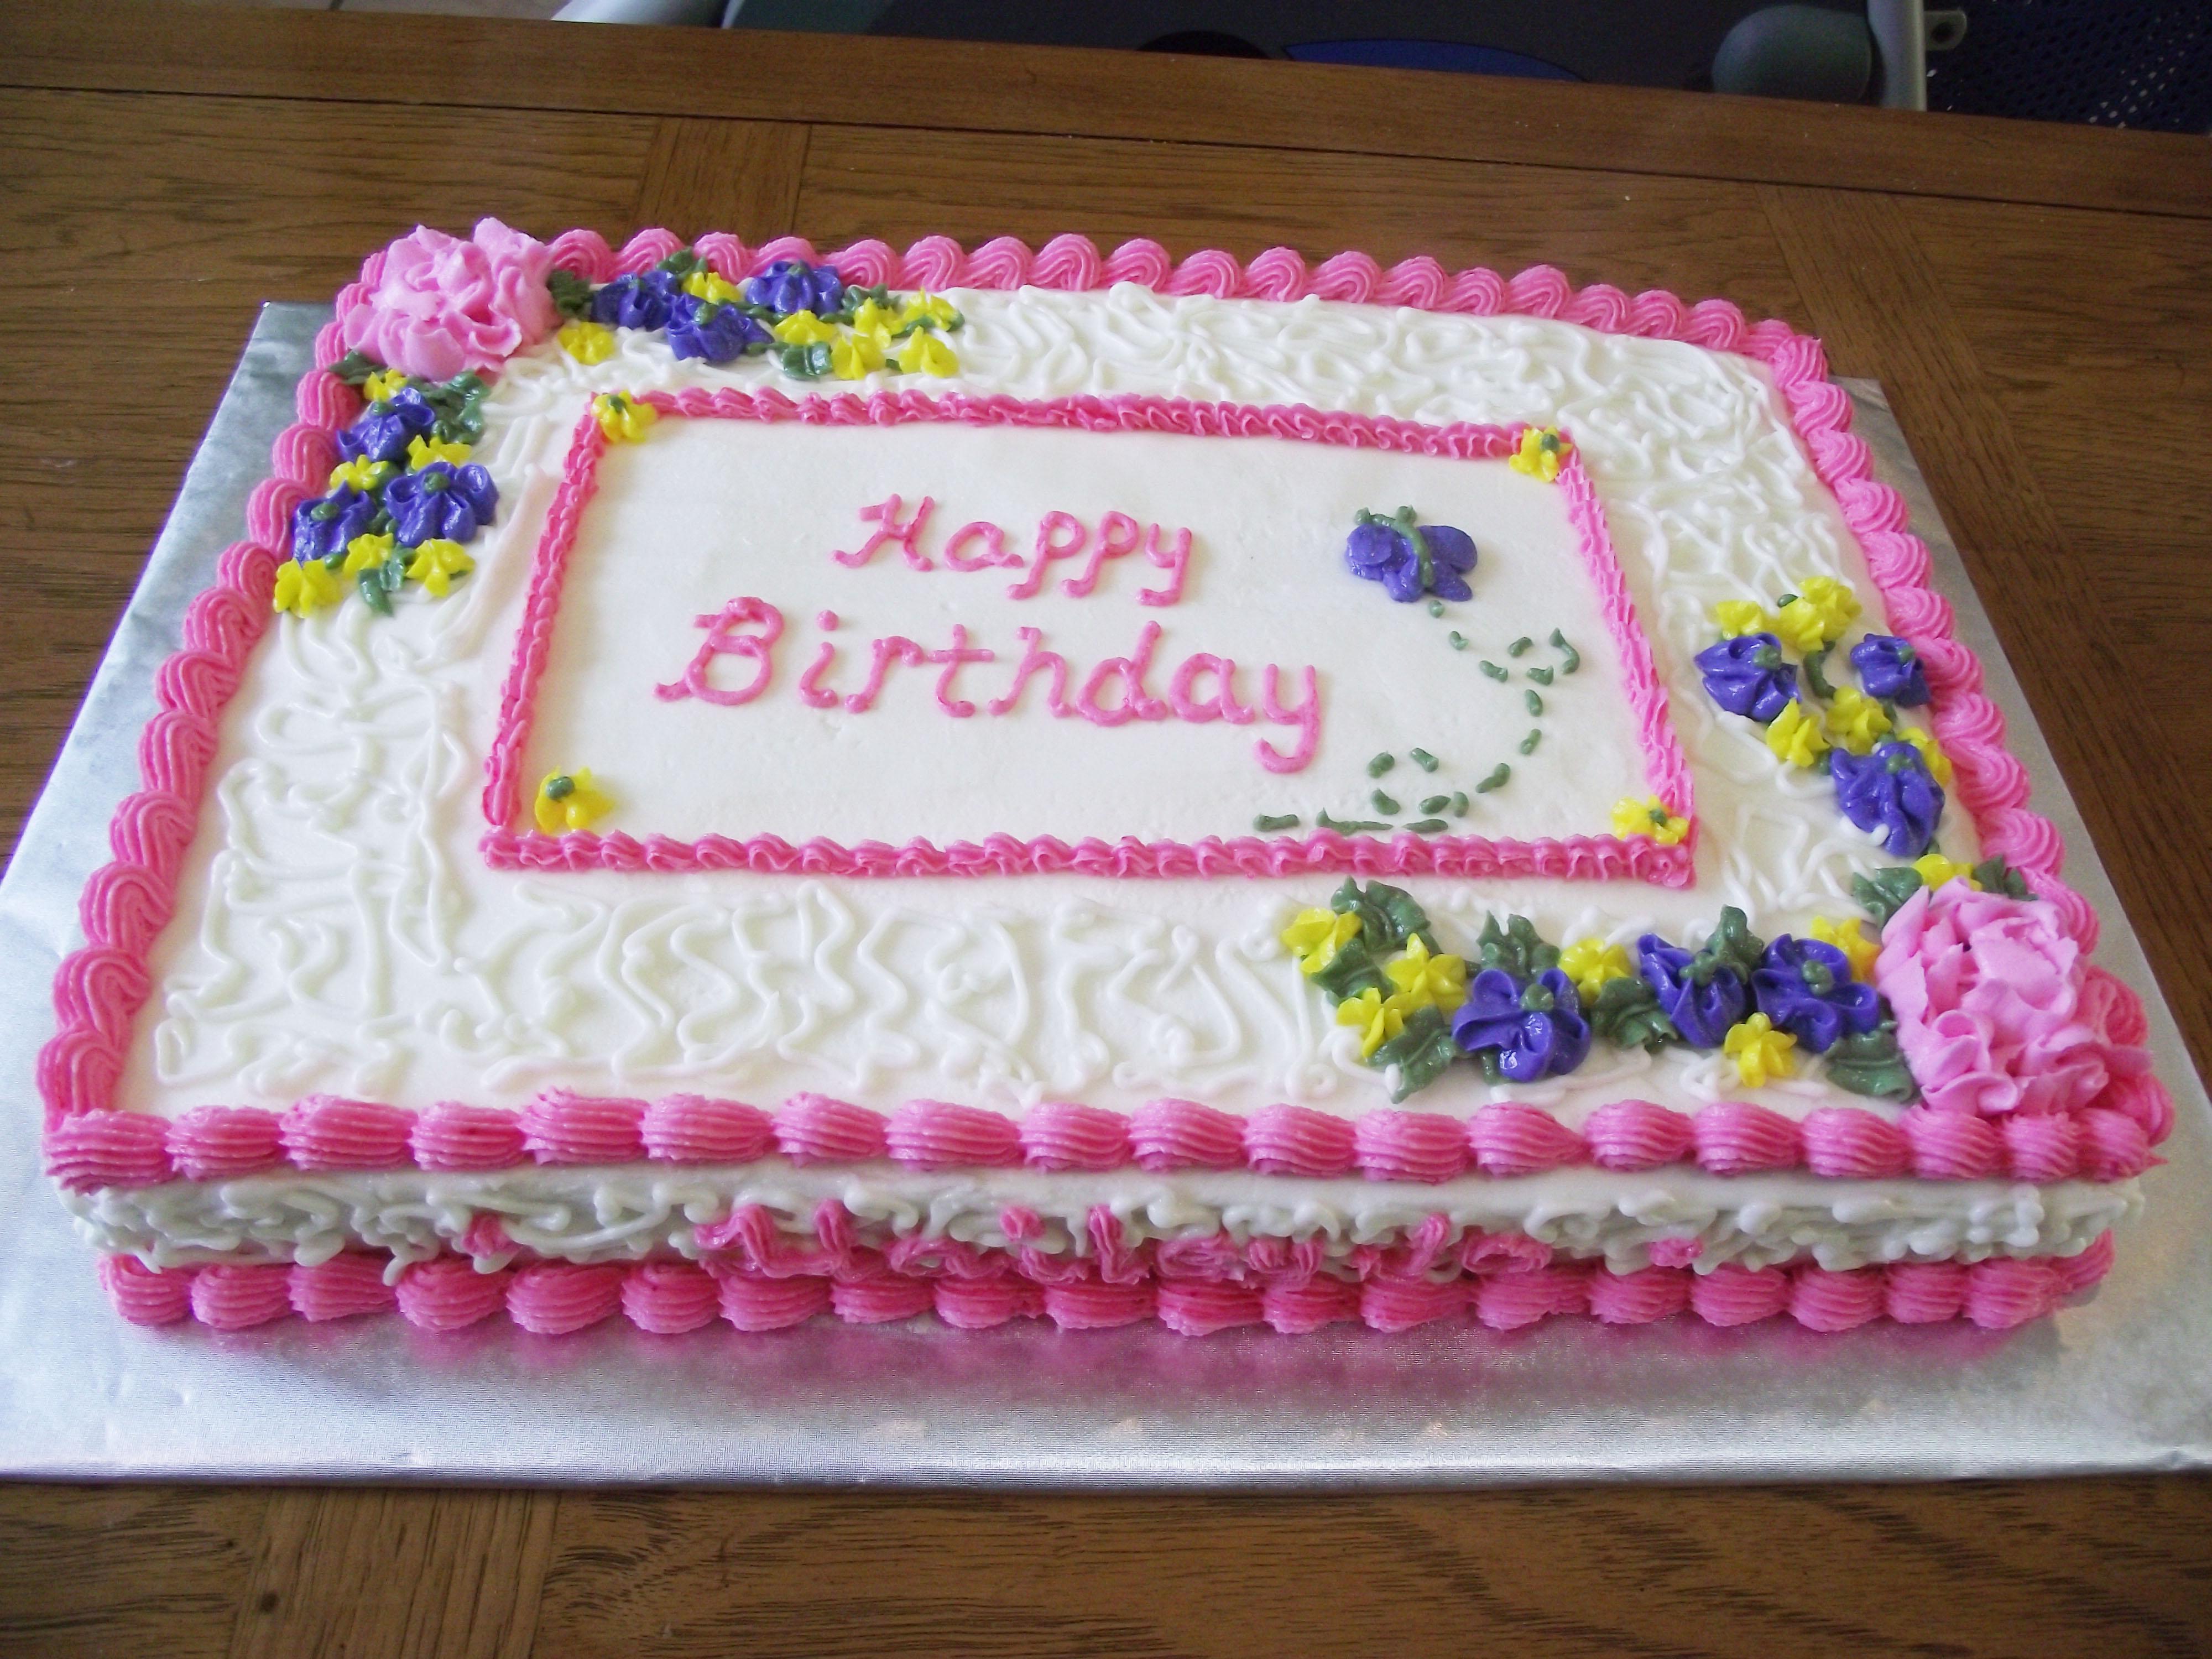 Easy Birthday Cake Ideas For 11 Year Old Boy Easy Birthday Cake